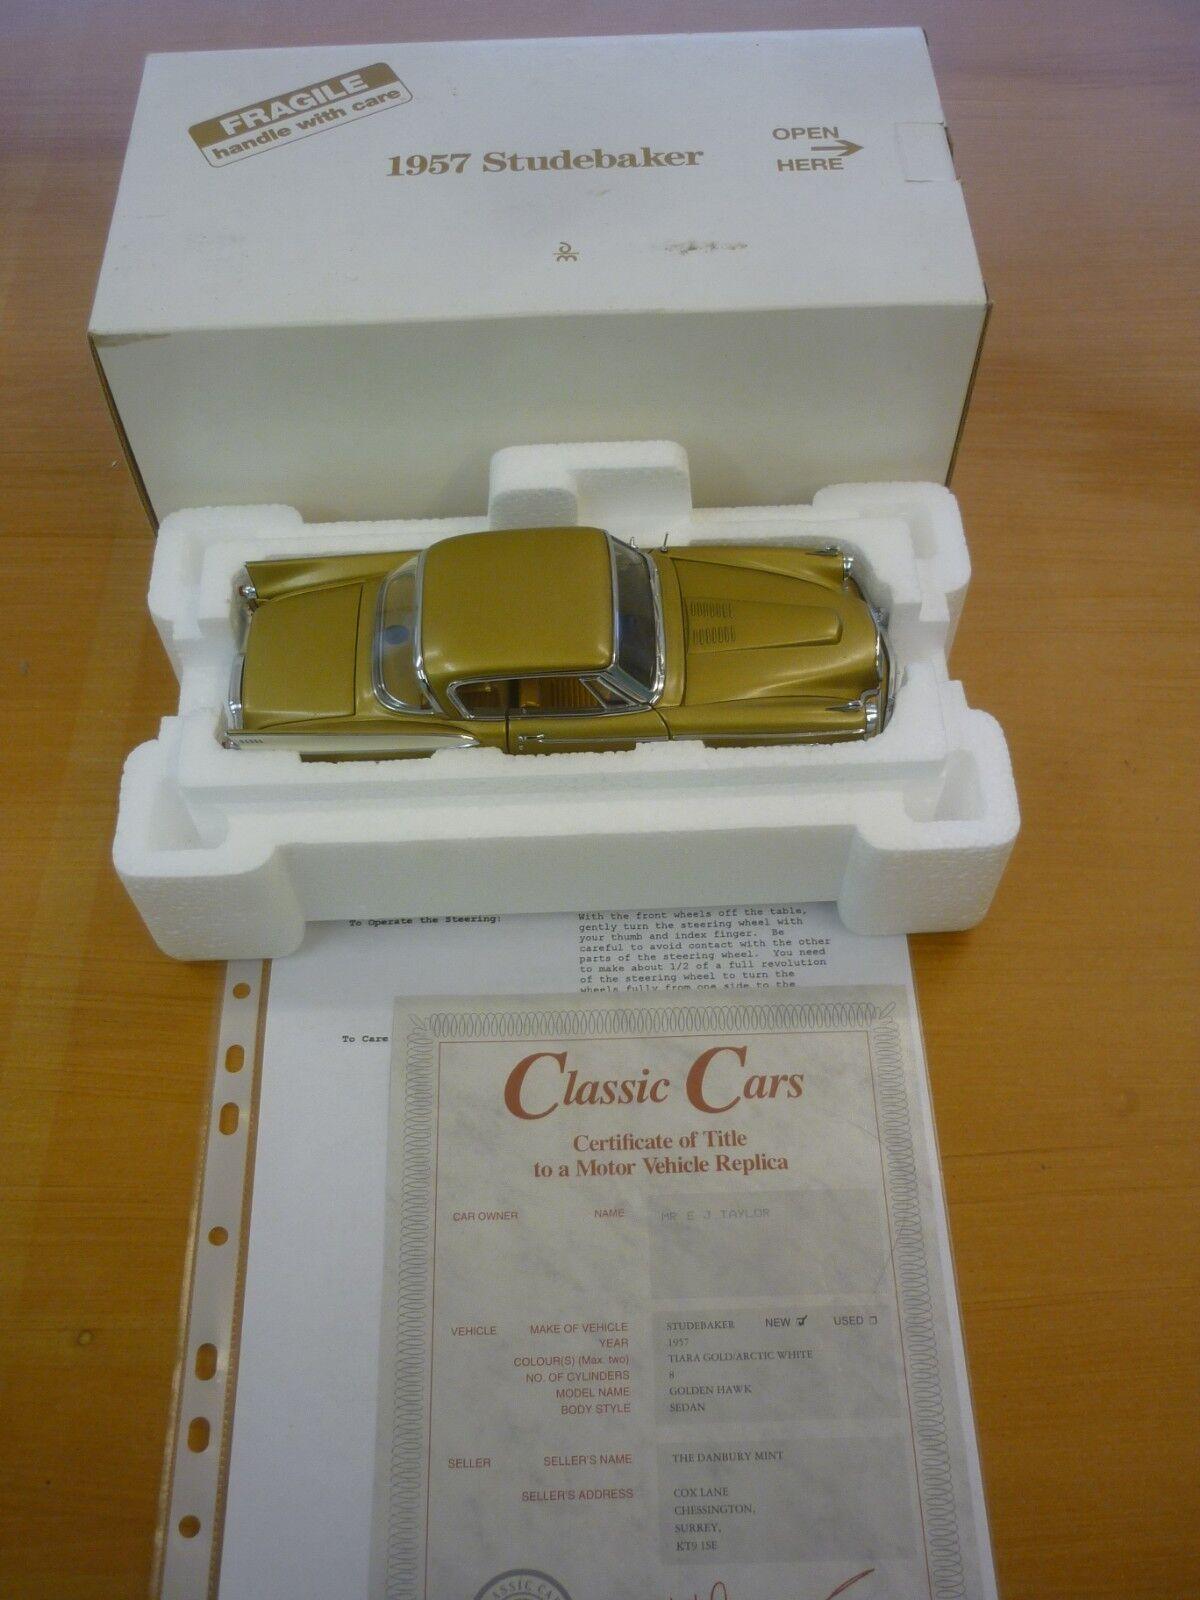 A Danbury mint scale model of a 1957 Studebaker golden hawk,  paperwork, boxed